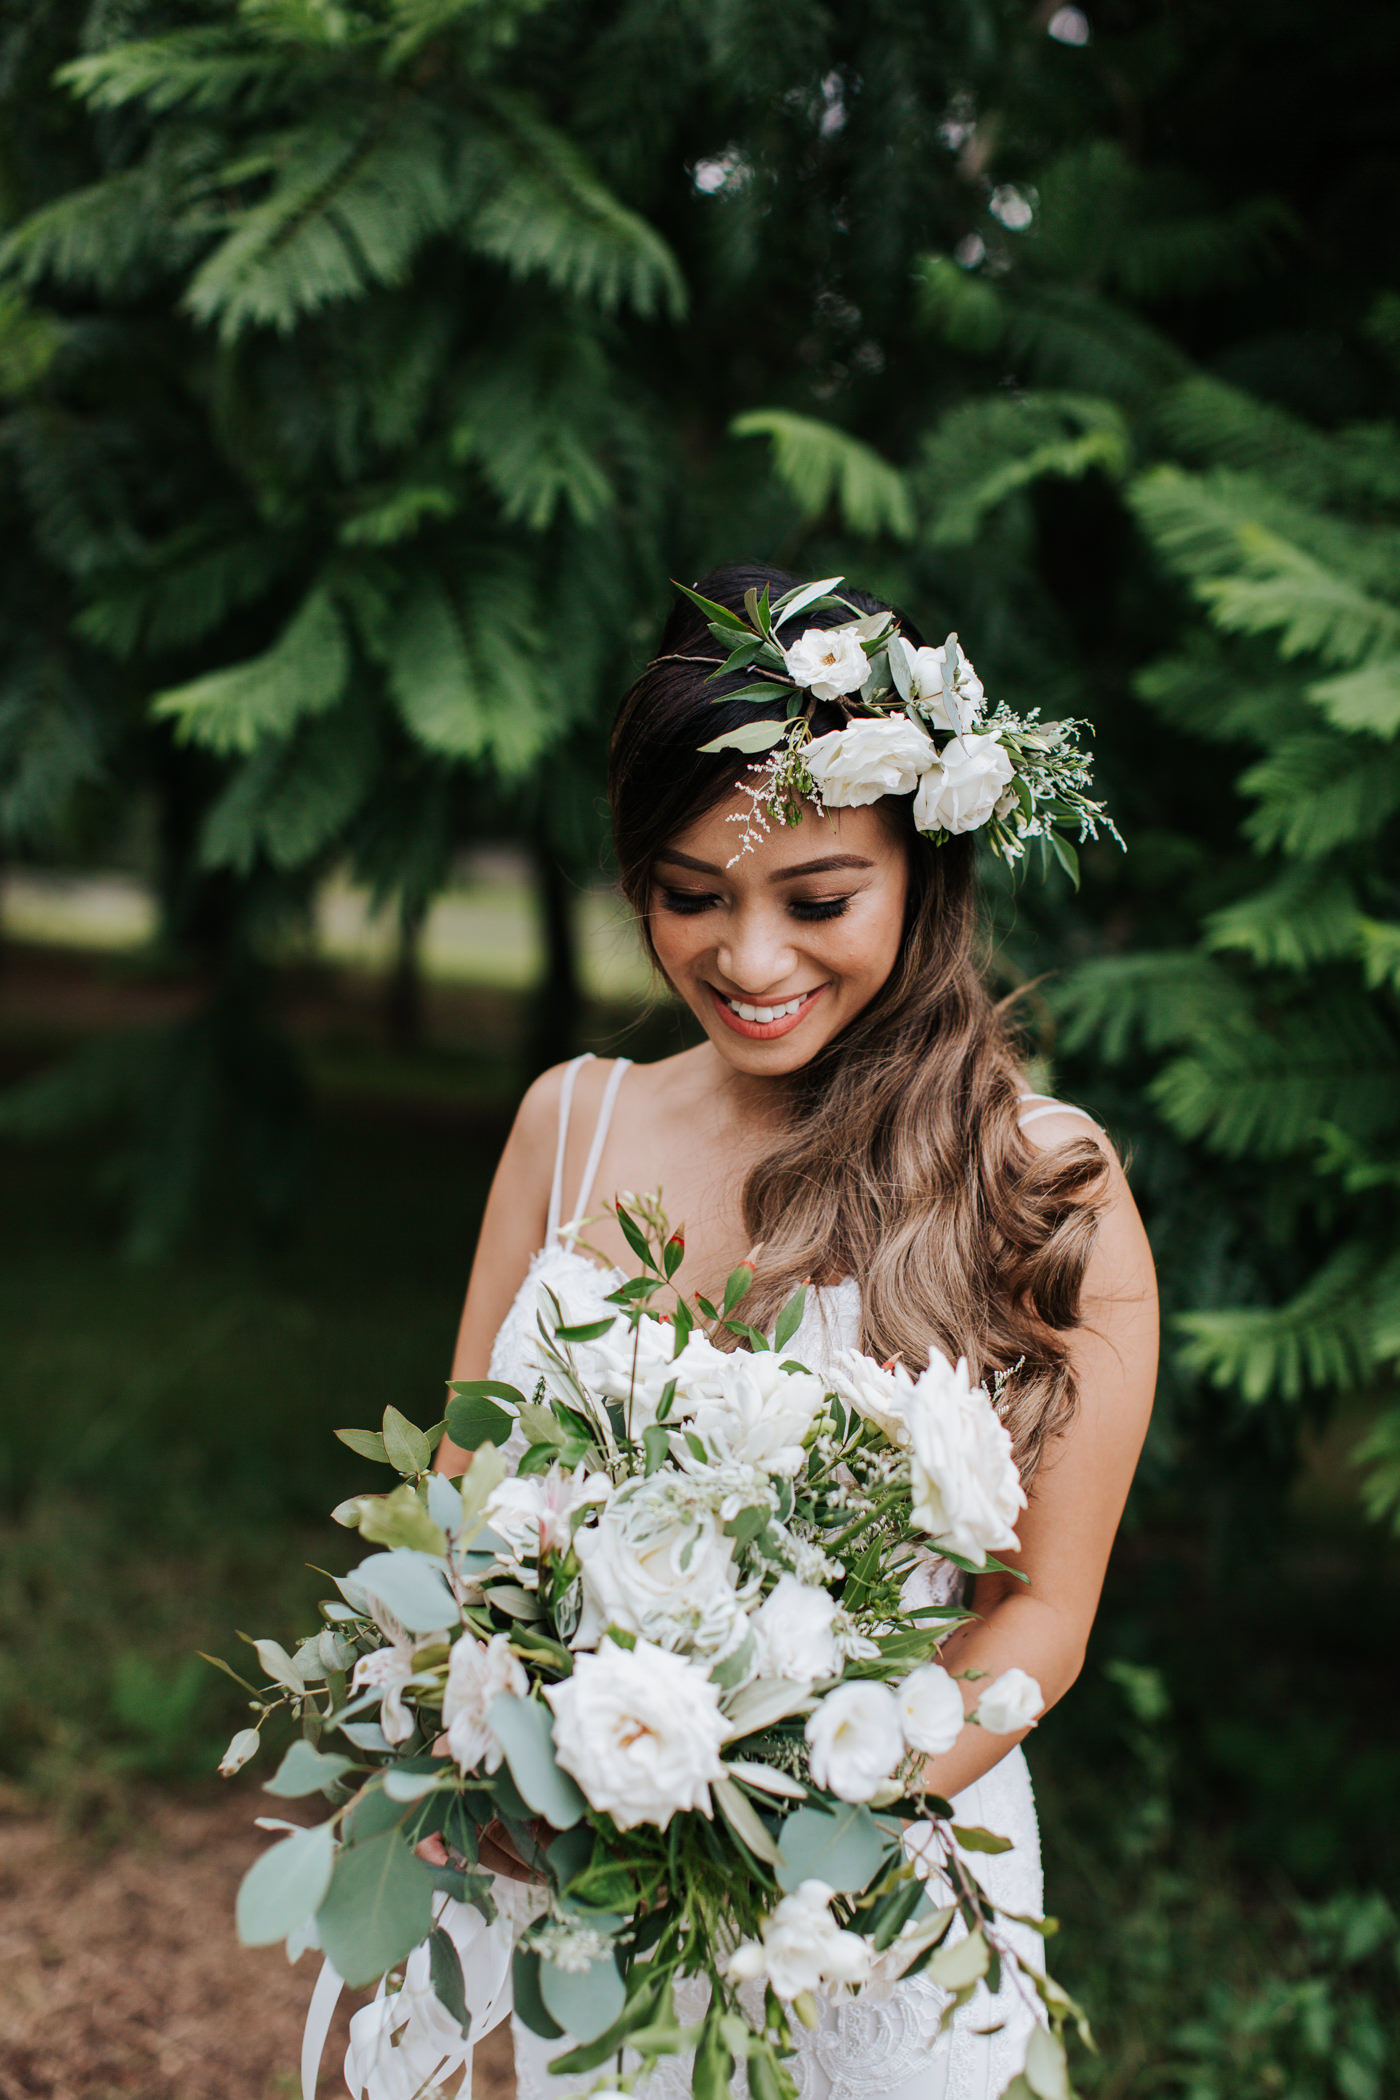 Nick & Vanezza - Fernbank Farm Wedding - Samantha Heather Photography-95.jpg